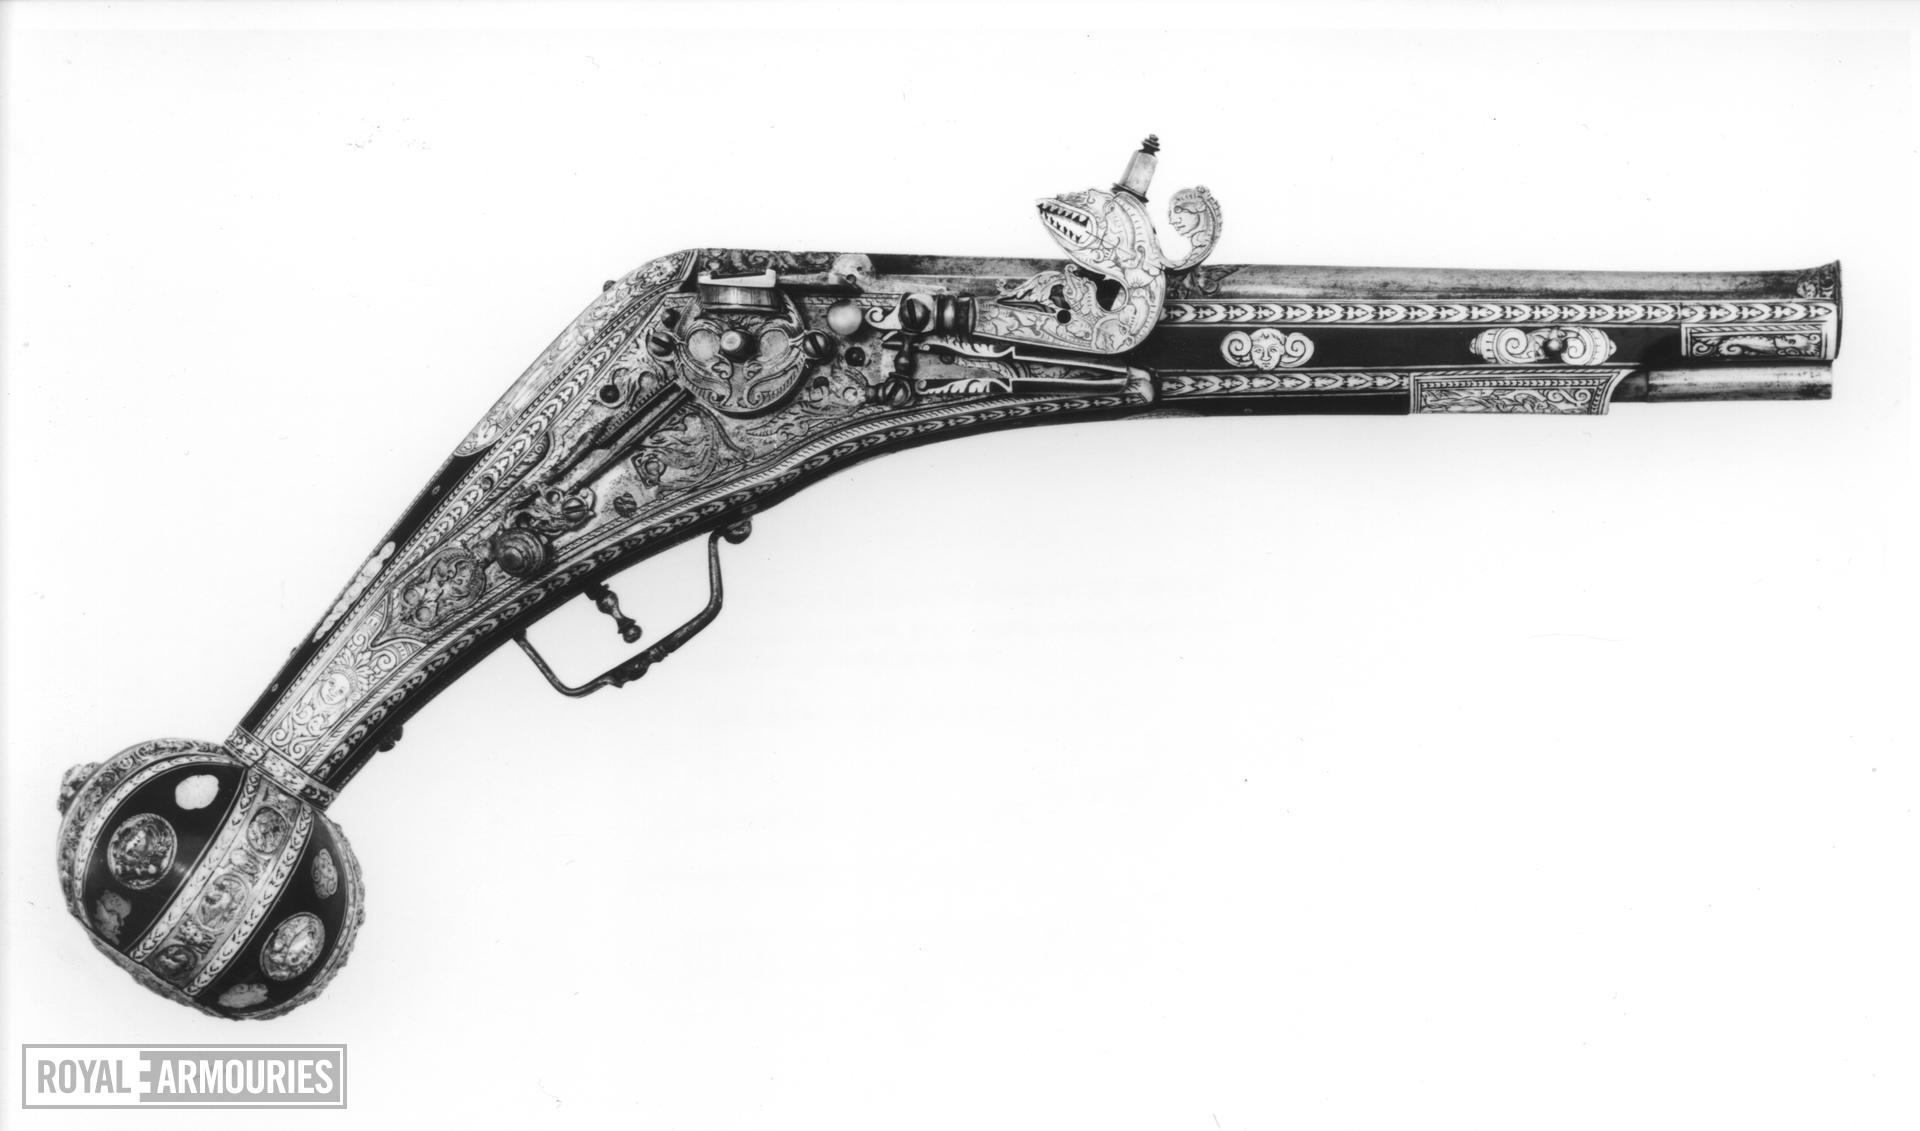 Wheellock holster pistol Lock by Wolf Stopler